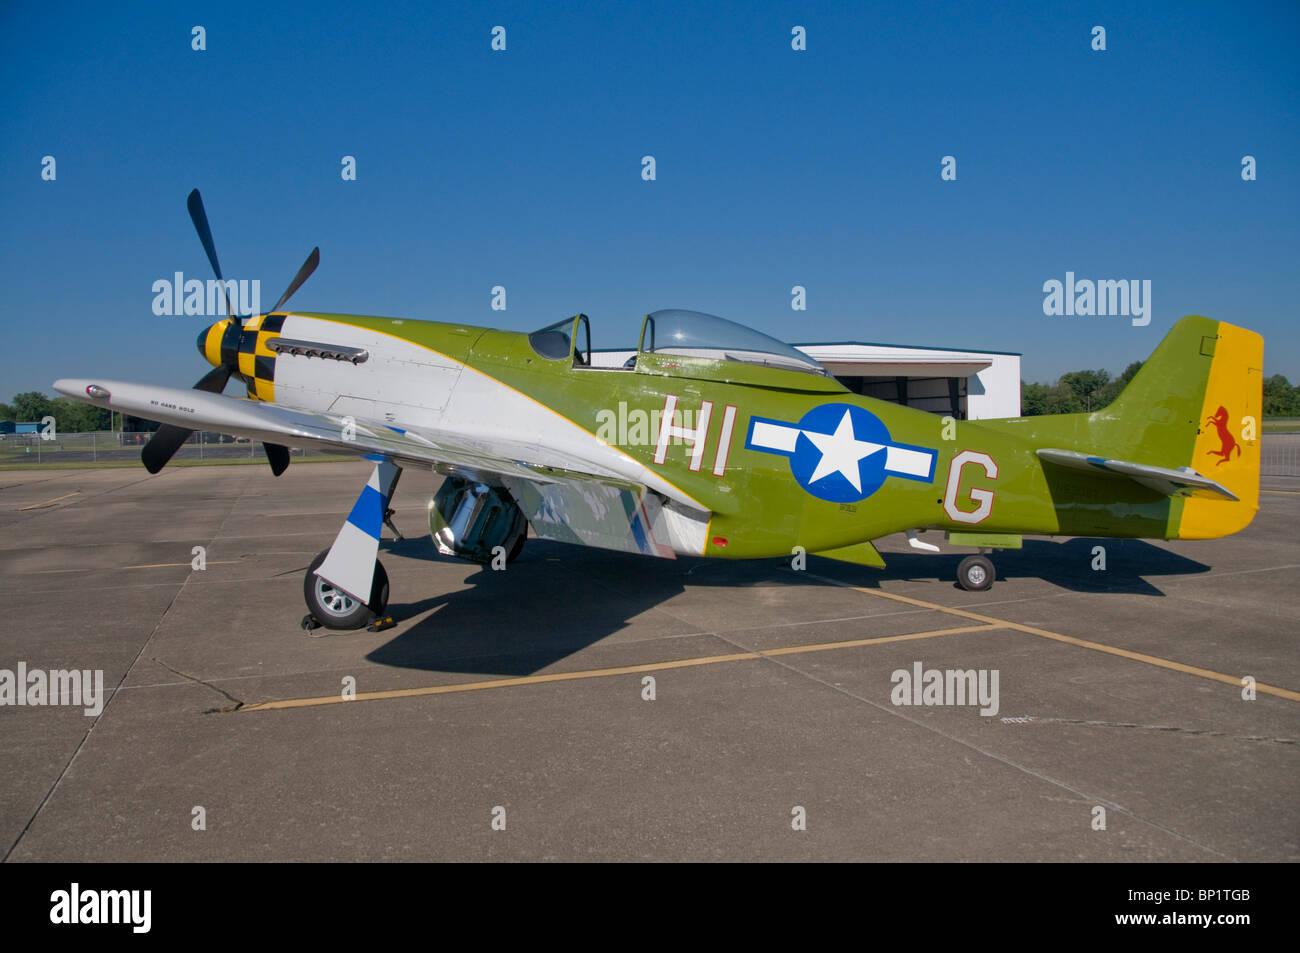 1951 US Army Airplane, P-51 Mustang Airplane - Stock Image